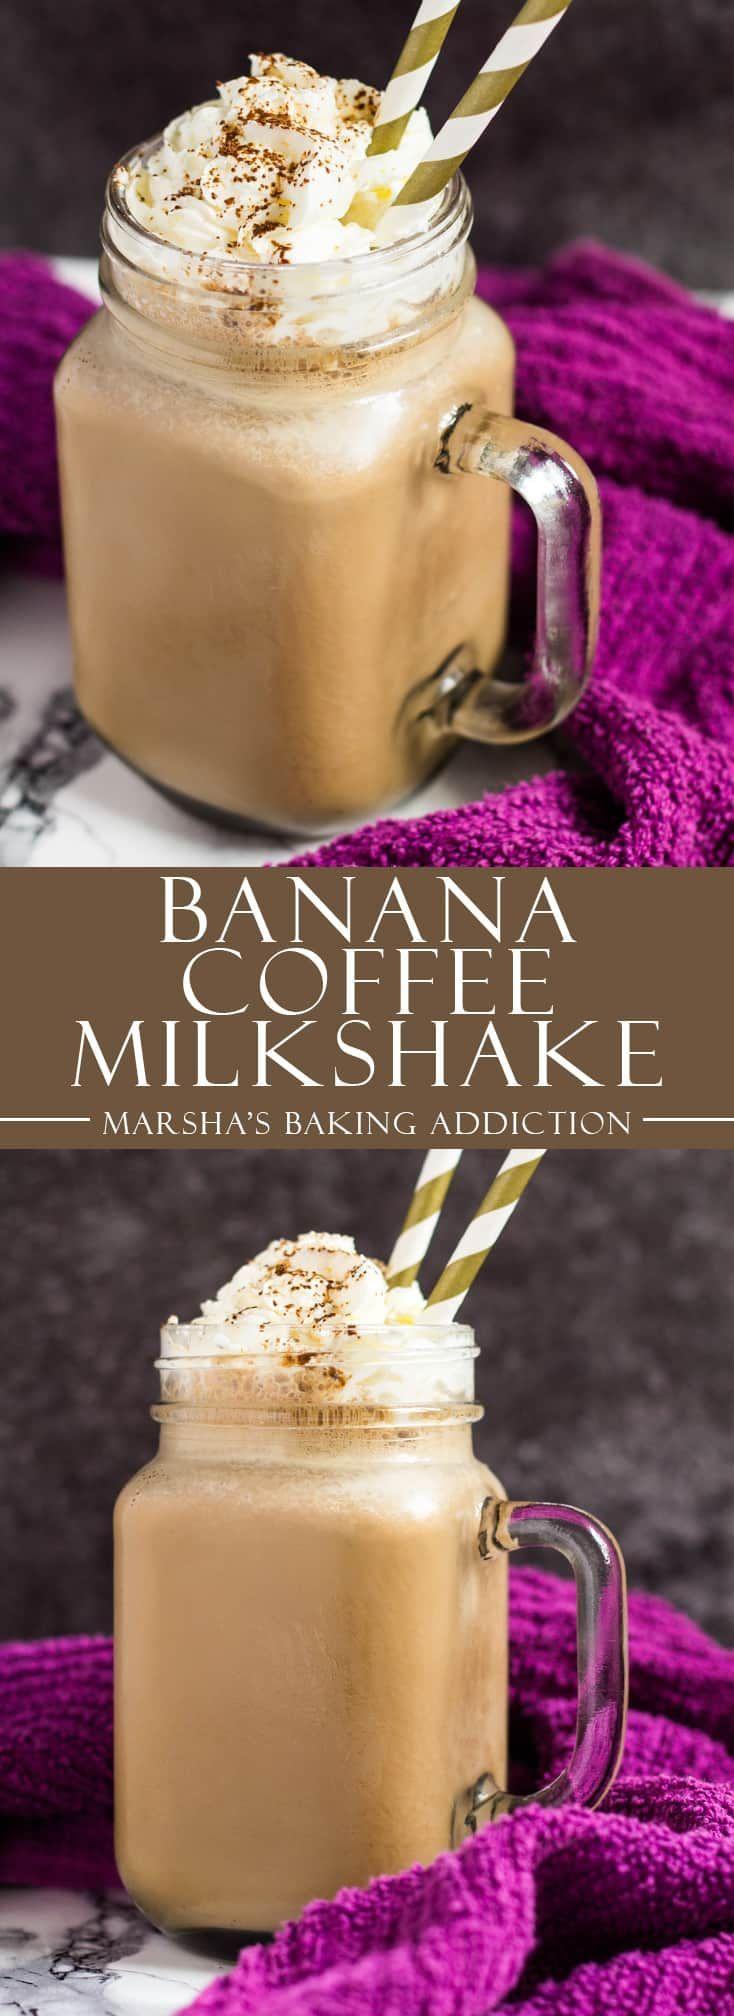 Banana Coffee Milkshake- Wonderfully creamy banana milkshake that is infused with coffee. Indulgent drink for coffee lovers!   marshasbakingaddiction.com   @marshasbakeblog #banana #coffee #milkshake #recipe